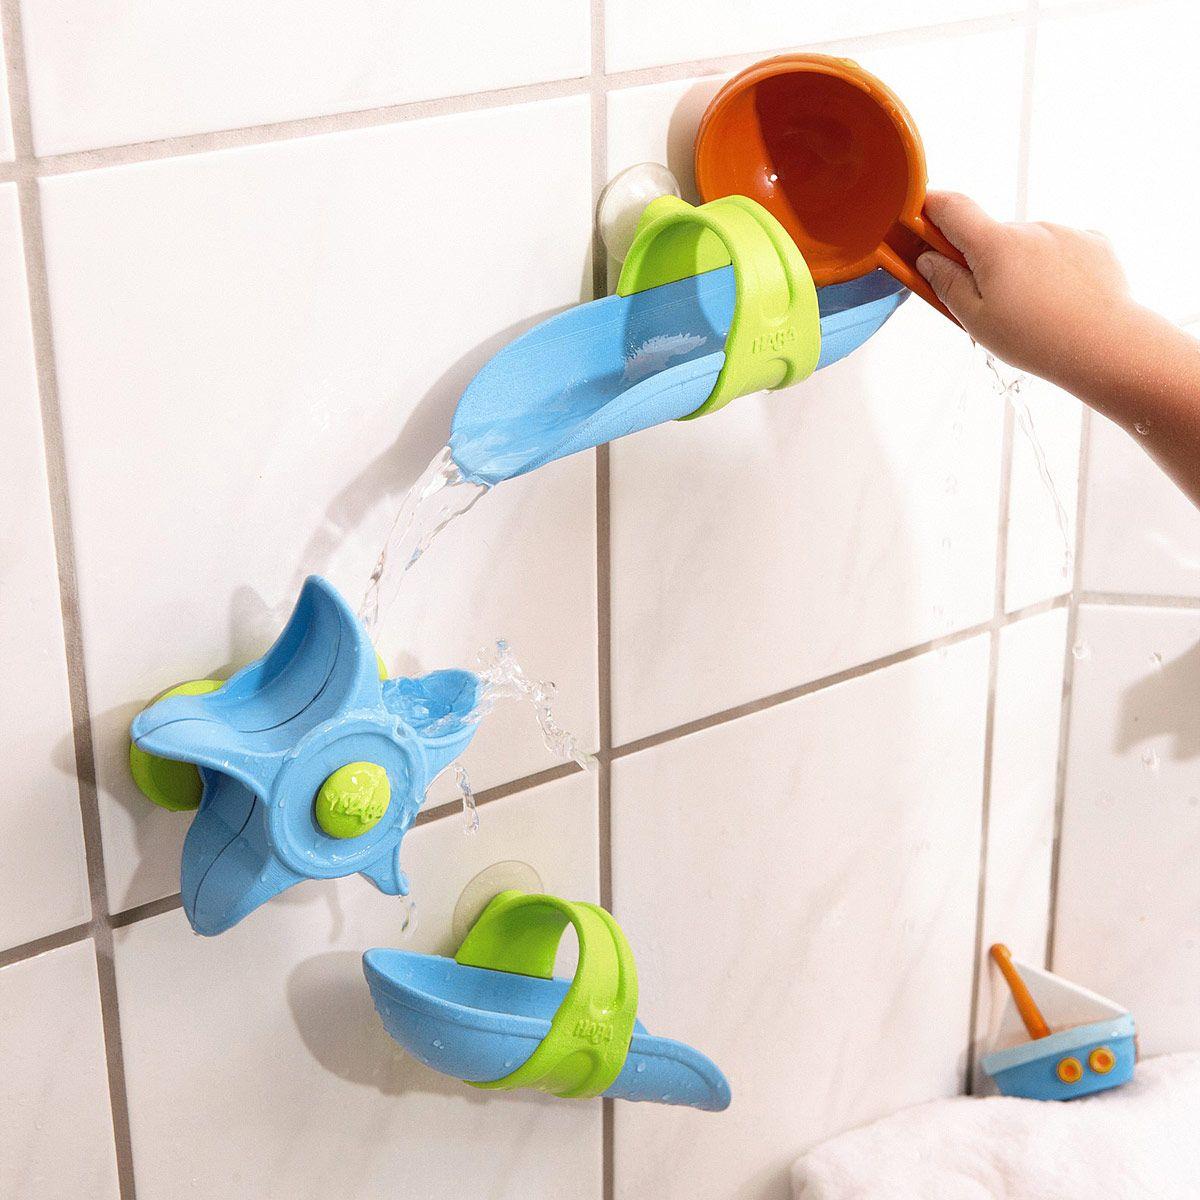 Bathtub Ball Track Playset | Bathtubs, Bath toys and Toy